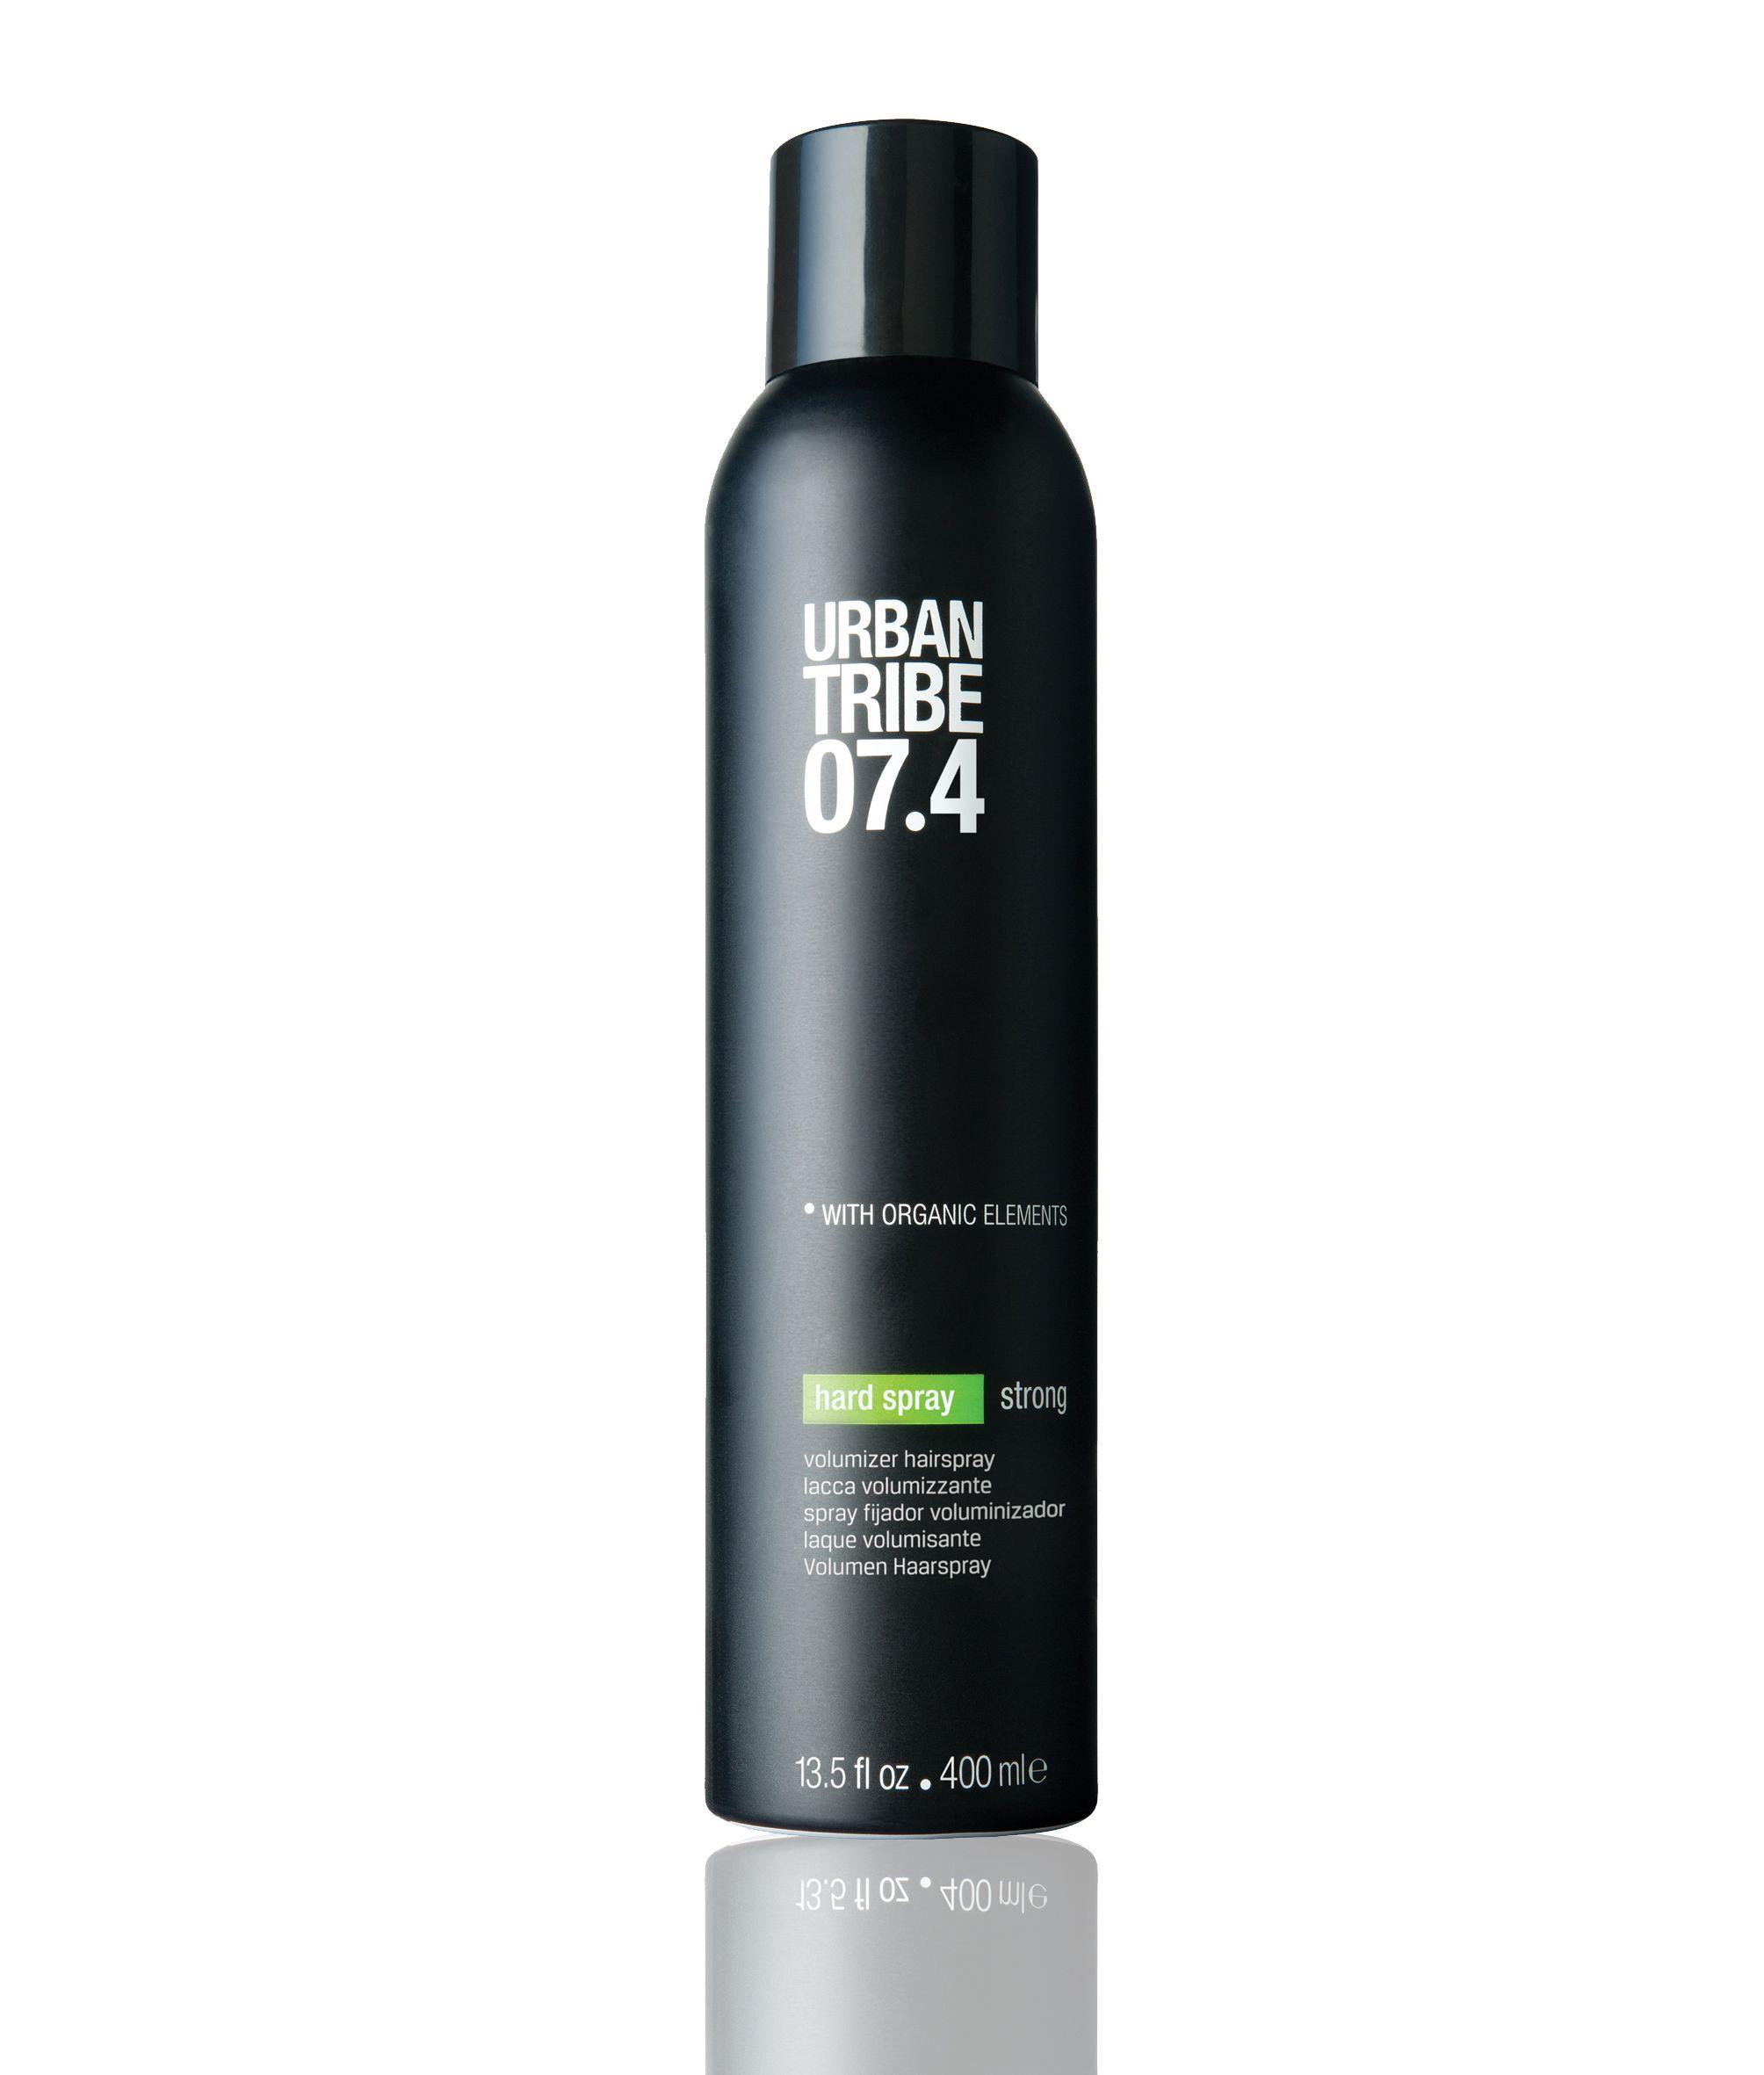 Urban Tribe 074 Hard Spray Volumizer Hairspray With Organic